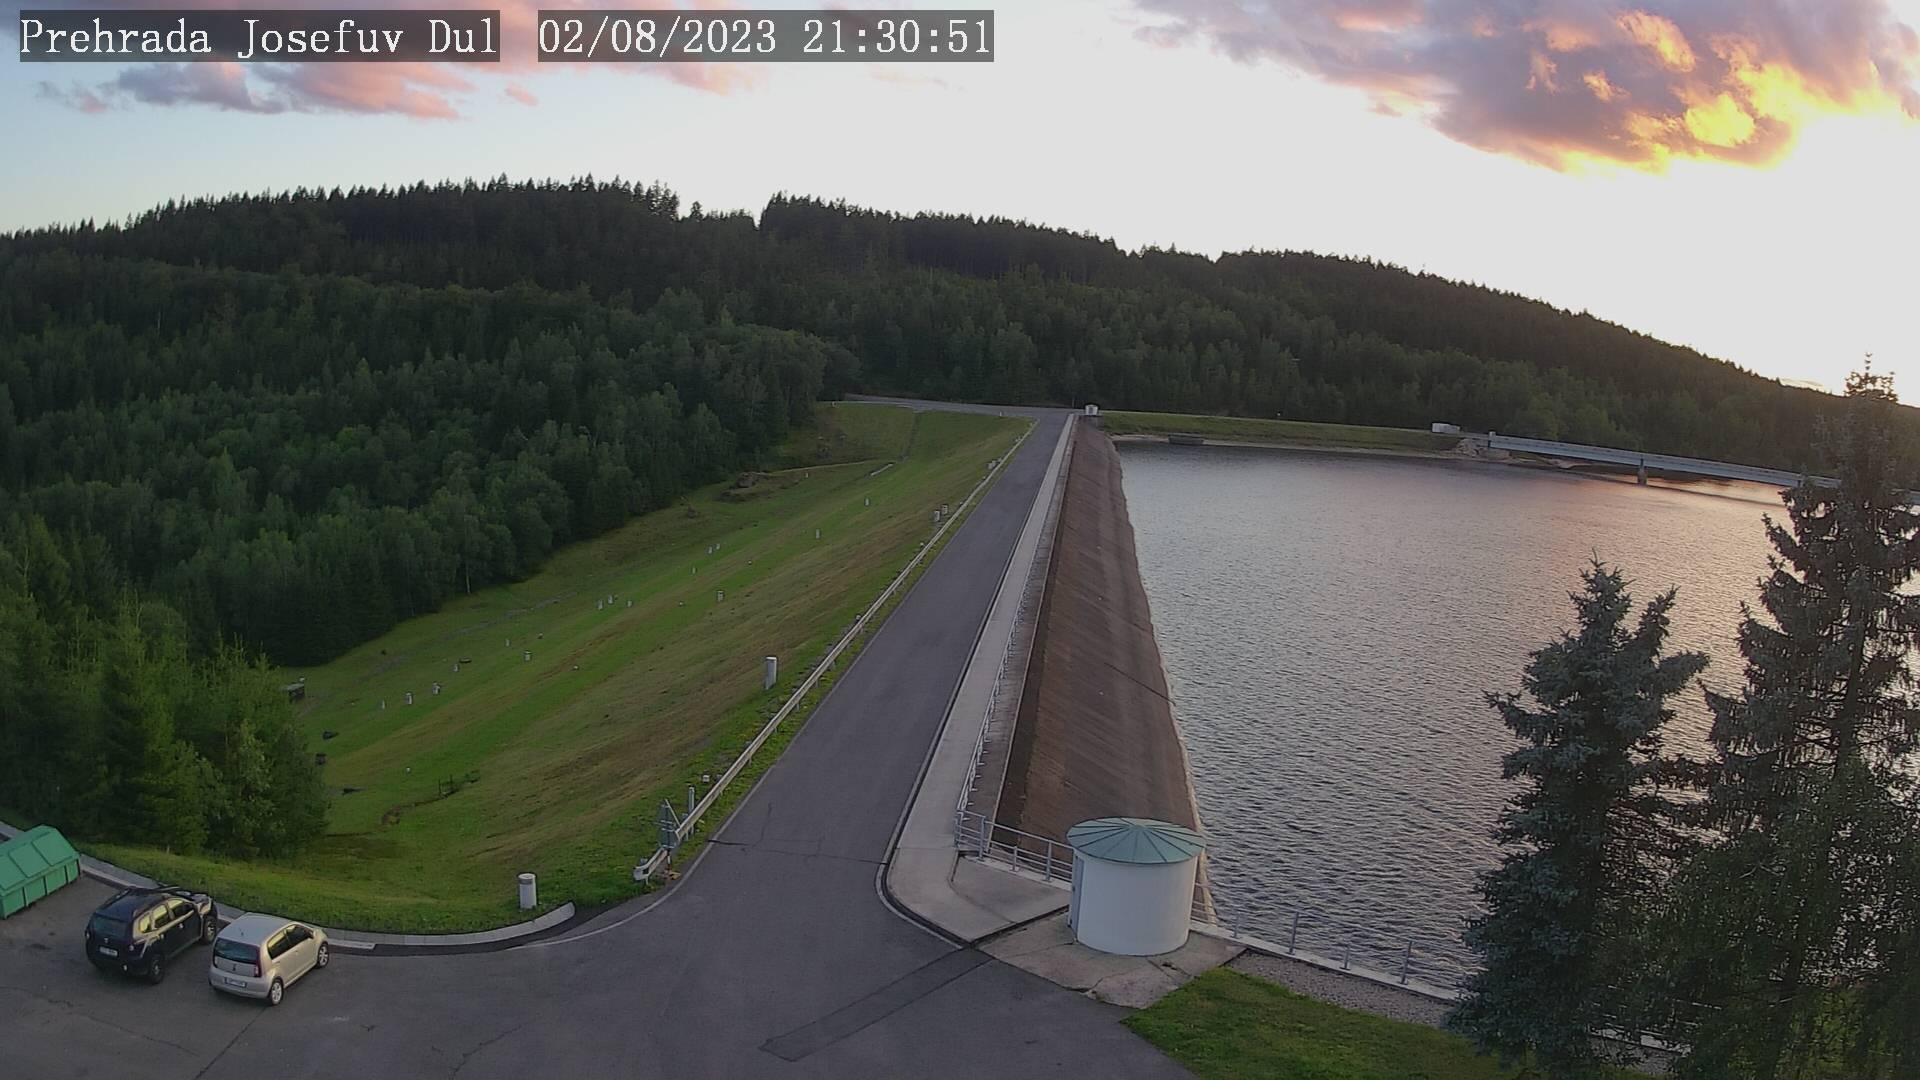 Webkamera - Přehrada Josefův Důl